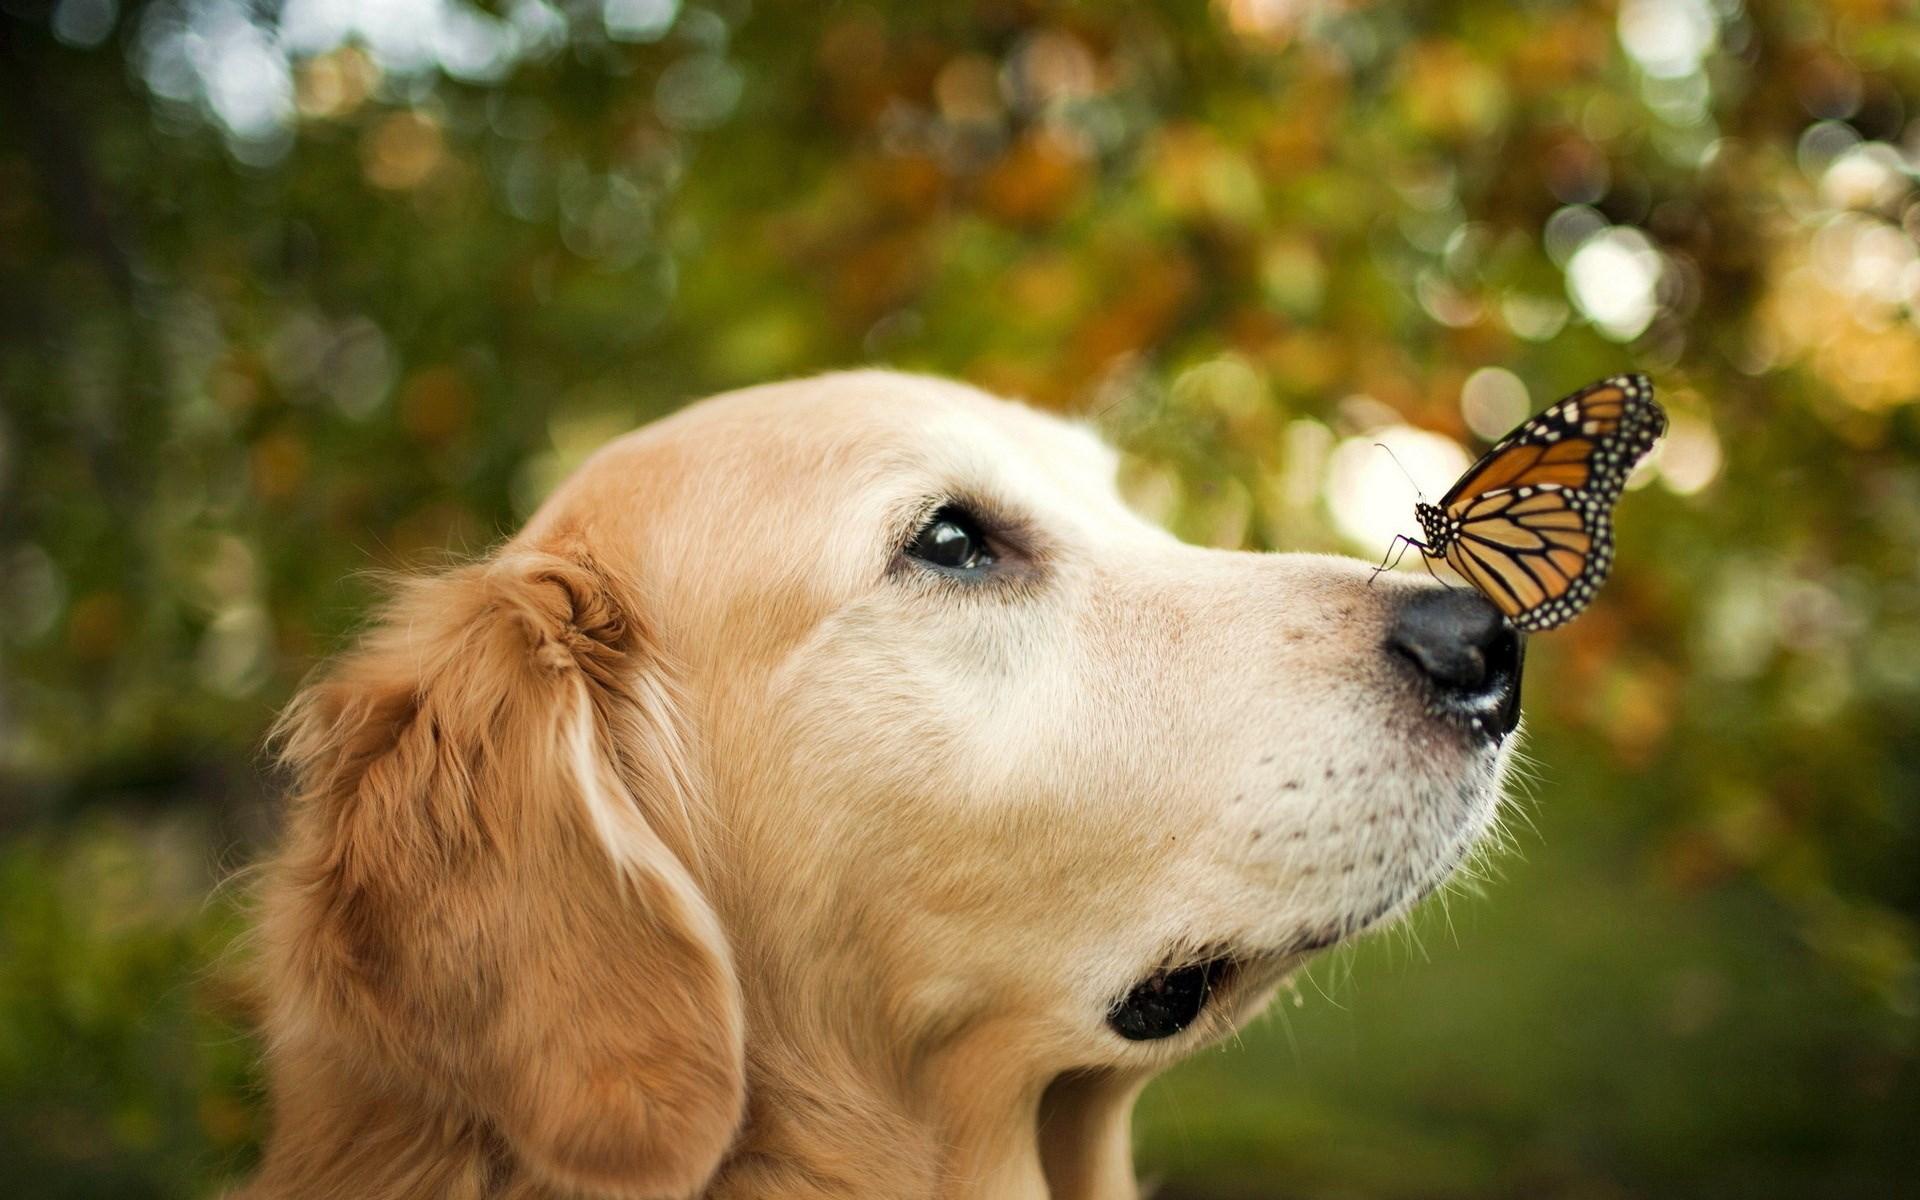 dog cute hd images